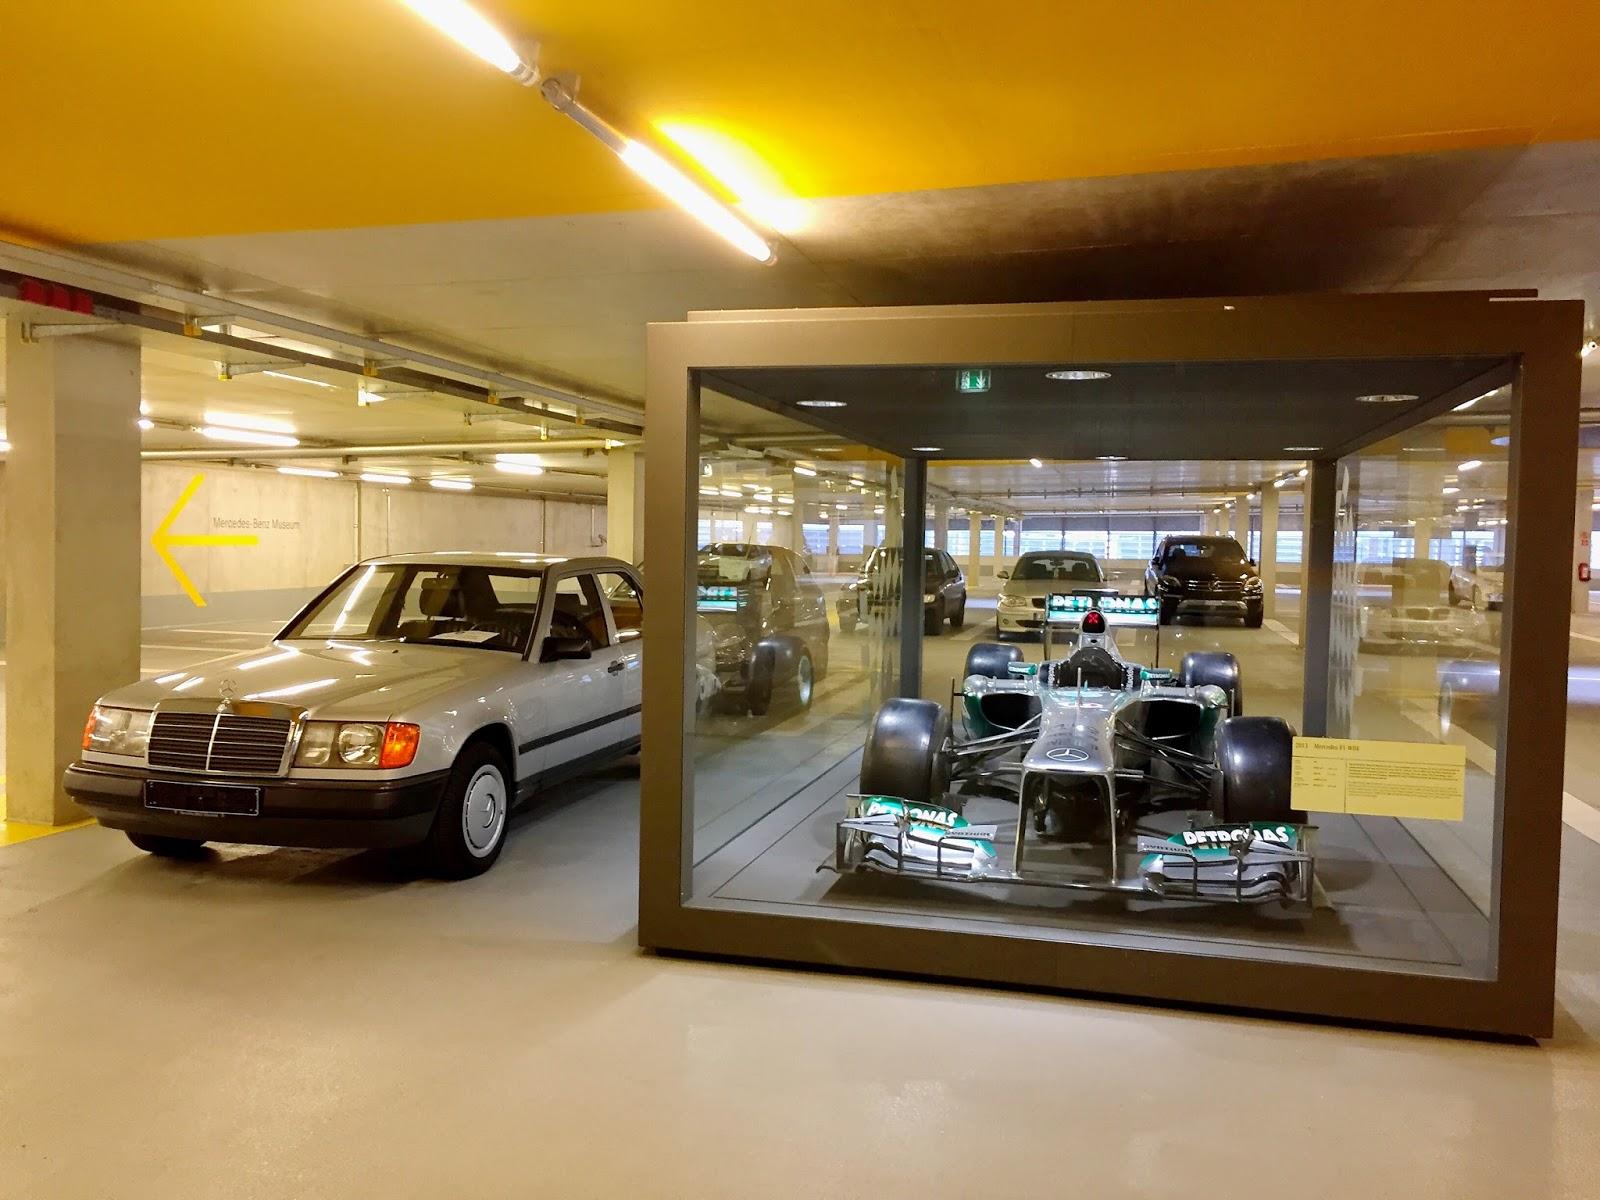 a1a5dee232 Mercedes Benz Museum Review Stuttgart Germany - Travel with Hobbit